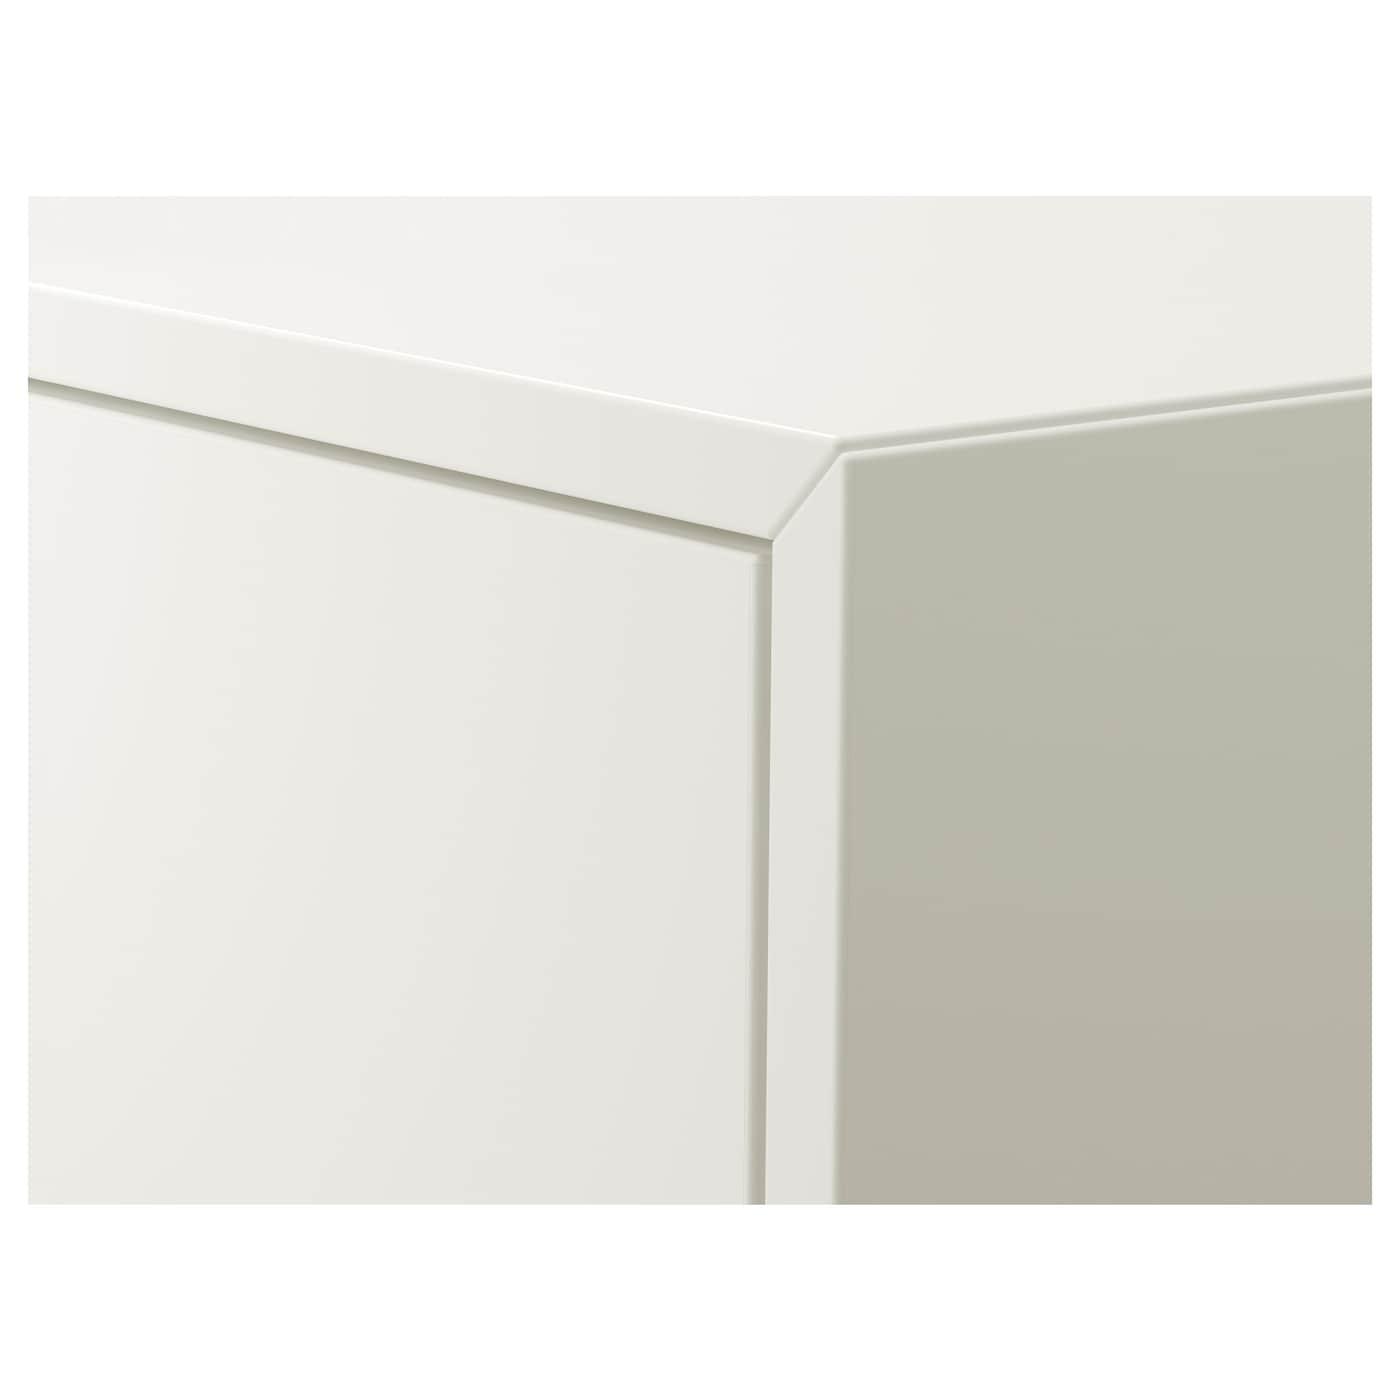 Wall Mounted Cabinet Combination Eket White Dark Grey Light Grey